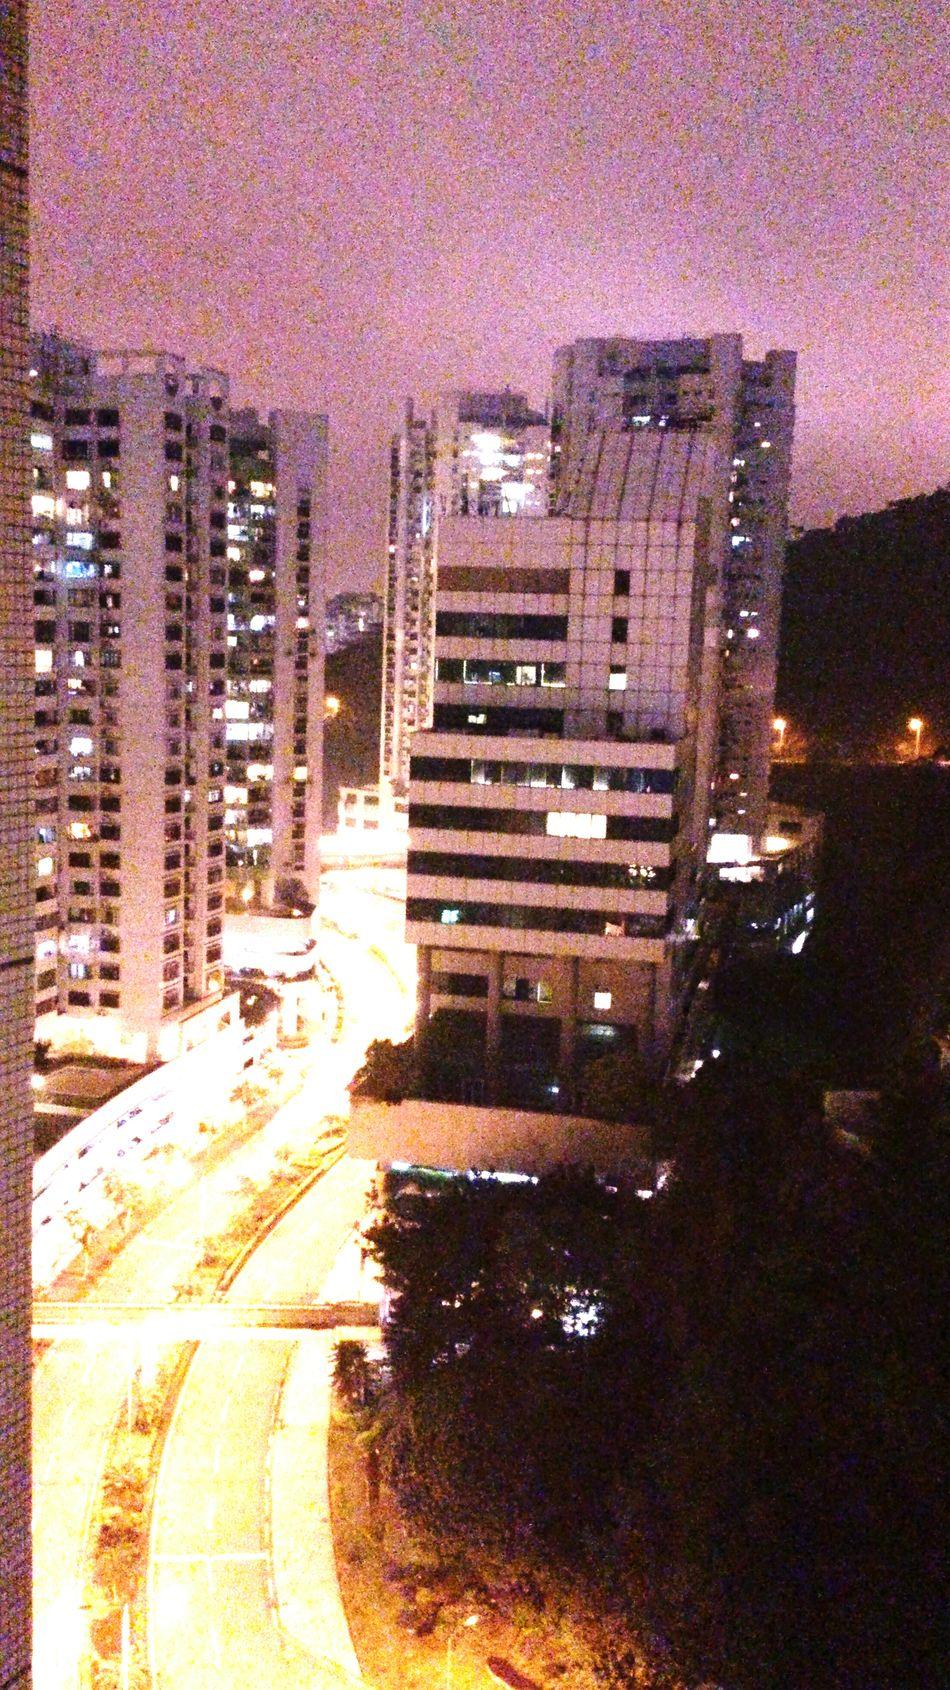 / Taipa Island/ BedroomView / City At Night /